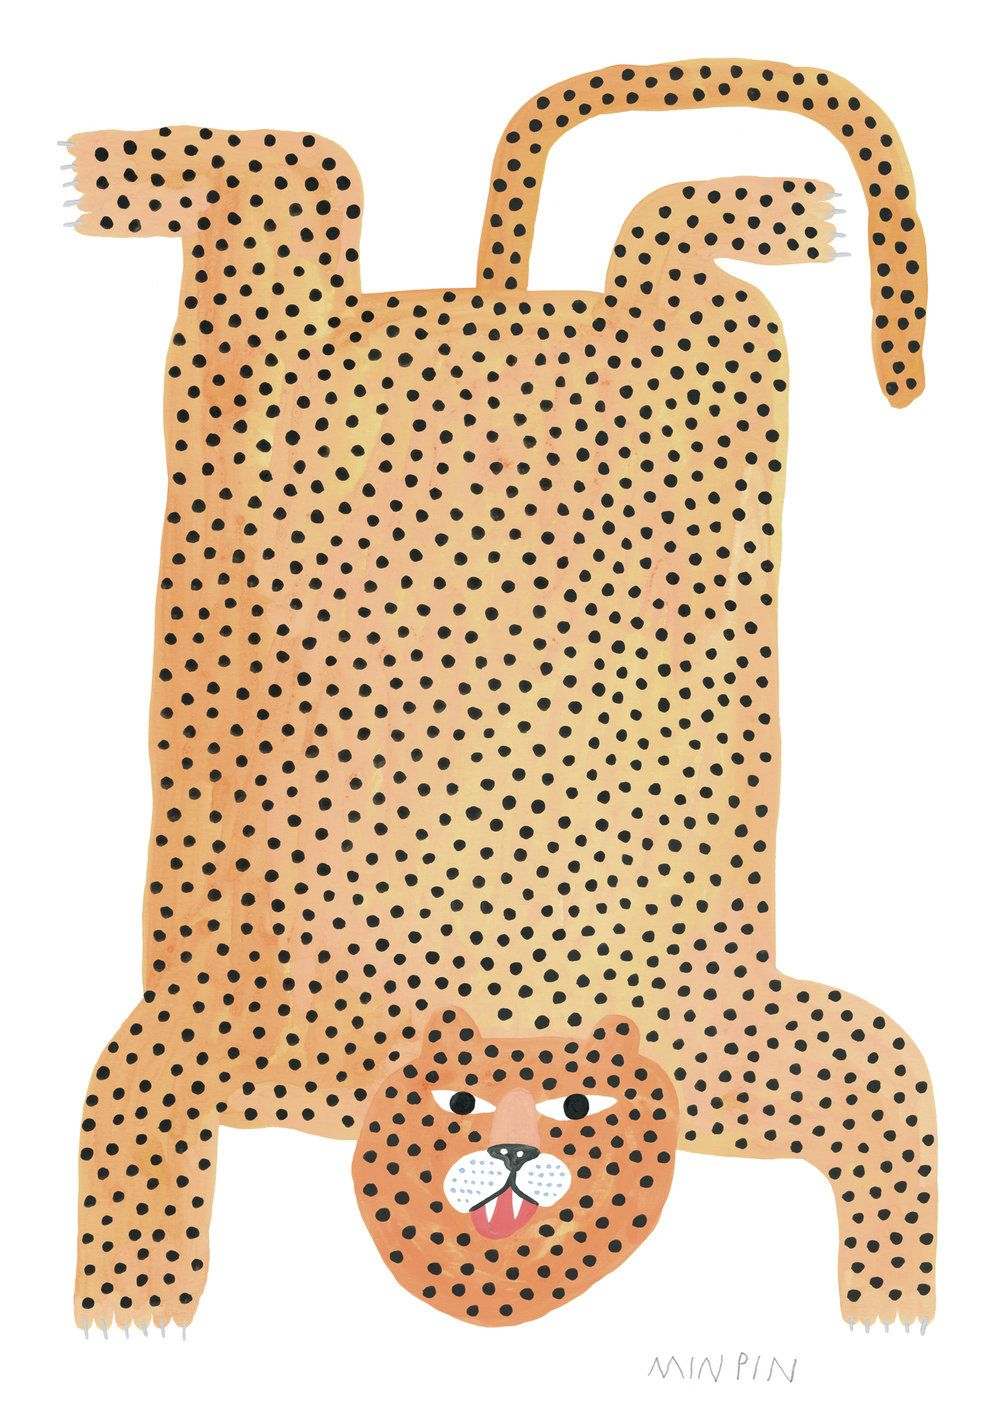 Jaguar Rug Print Min Pin Illustration Art Animal Illustration Graphic Design Illustration